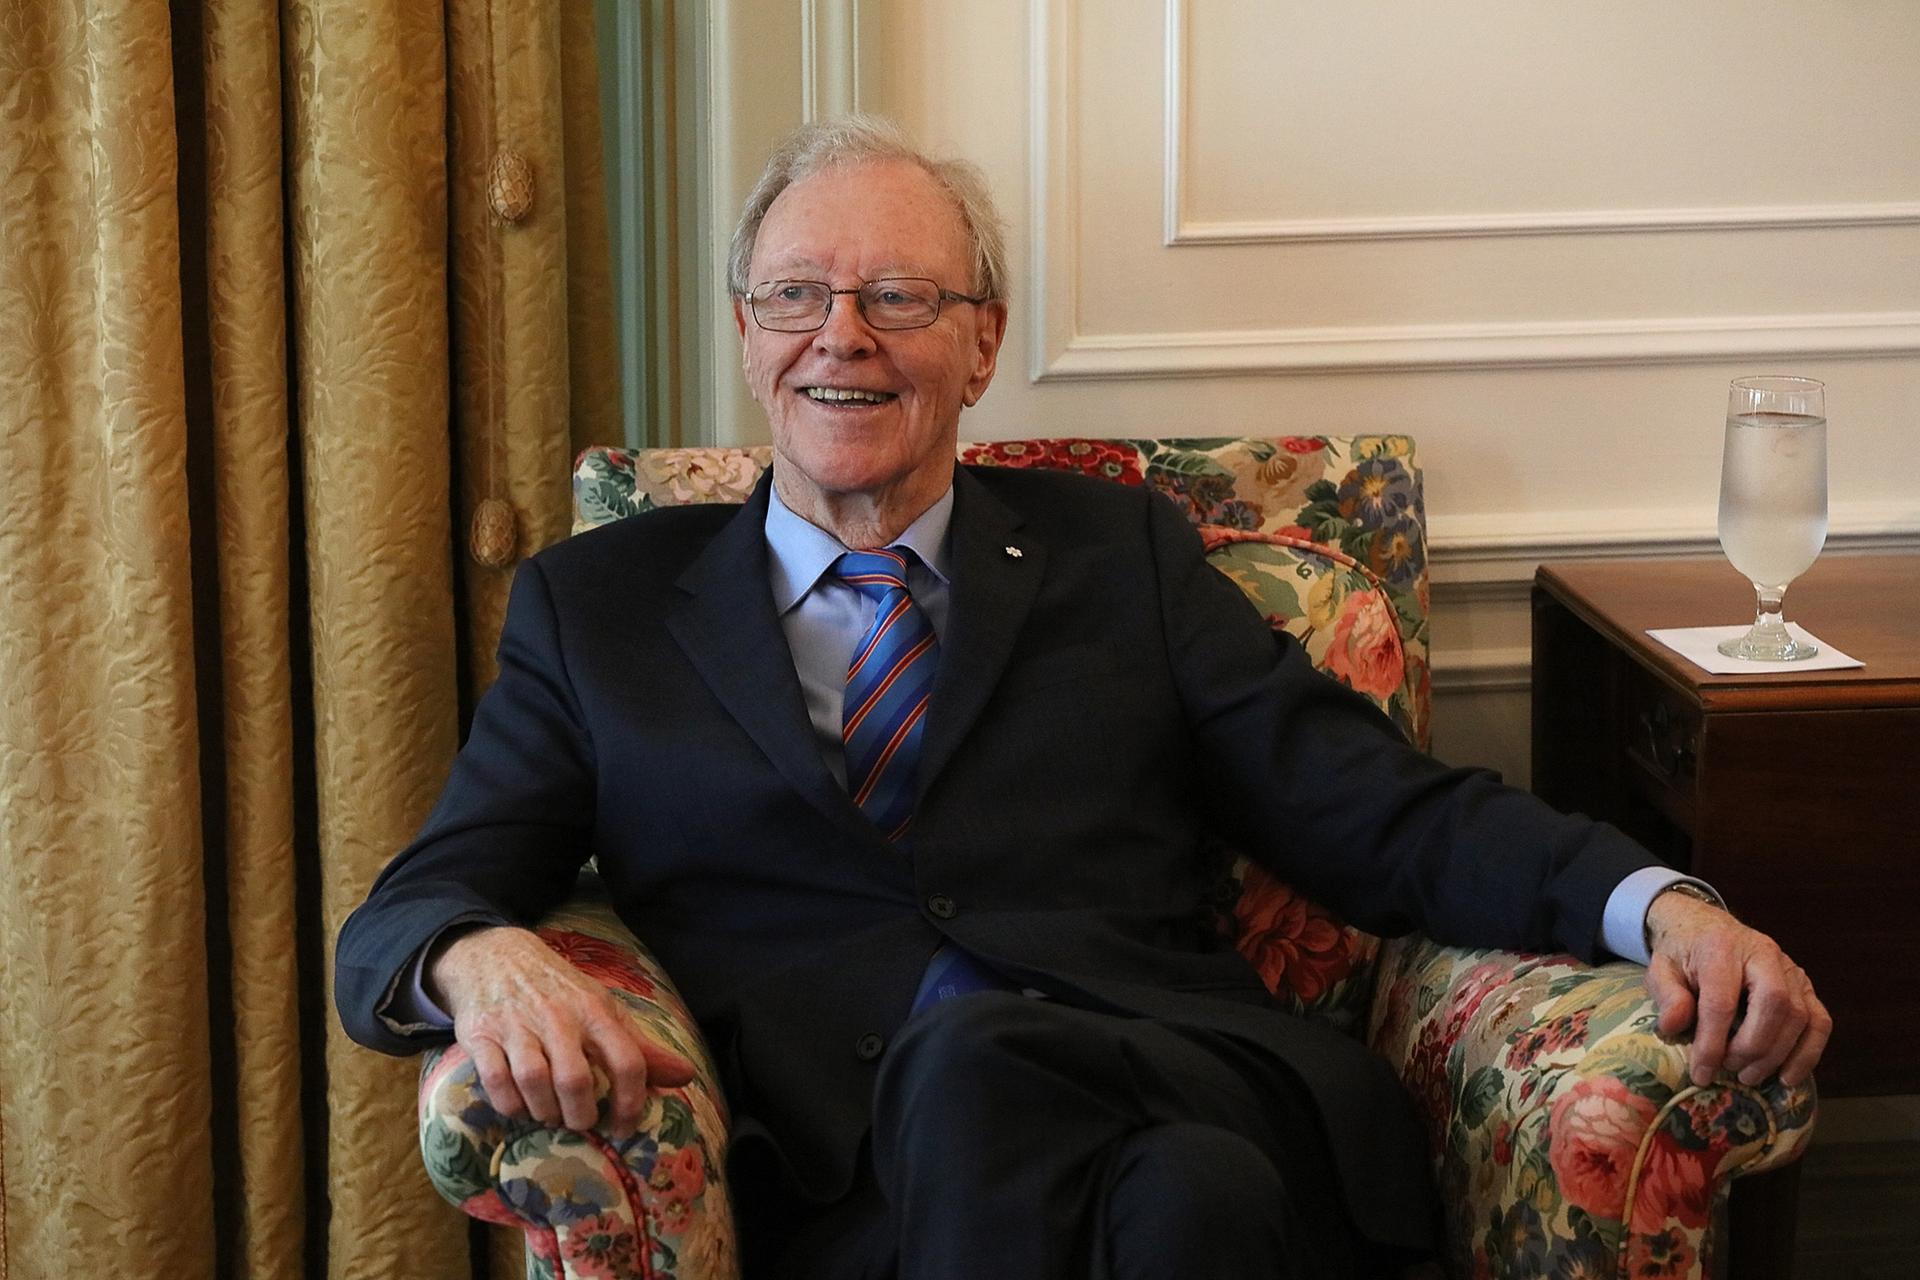 Donald R. Sobey at the Queen's University School of Graduate Studies Convocation in 2016 Photo: Bernard Clark